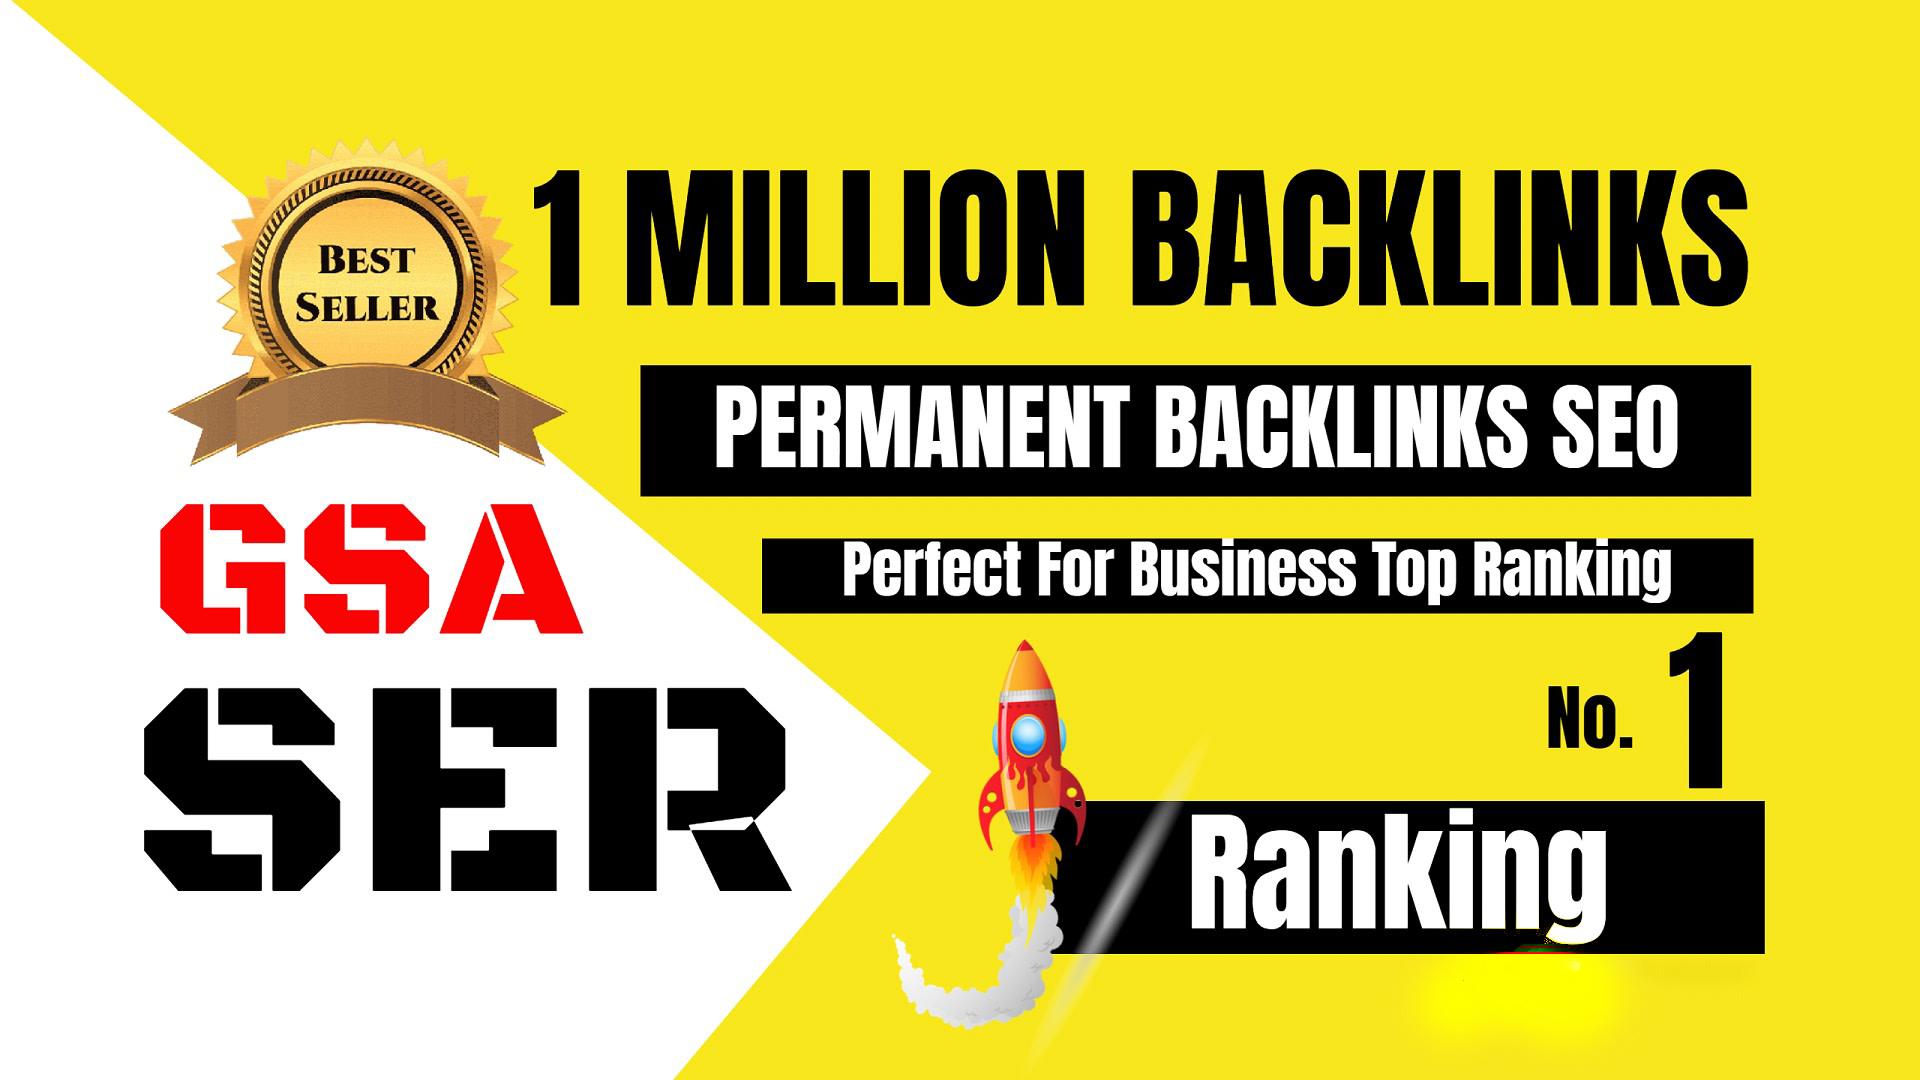 80K backlinks SEO skyrocket your rank in google